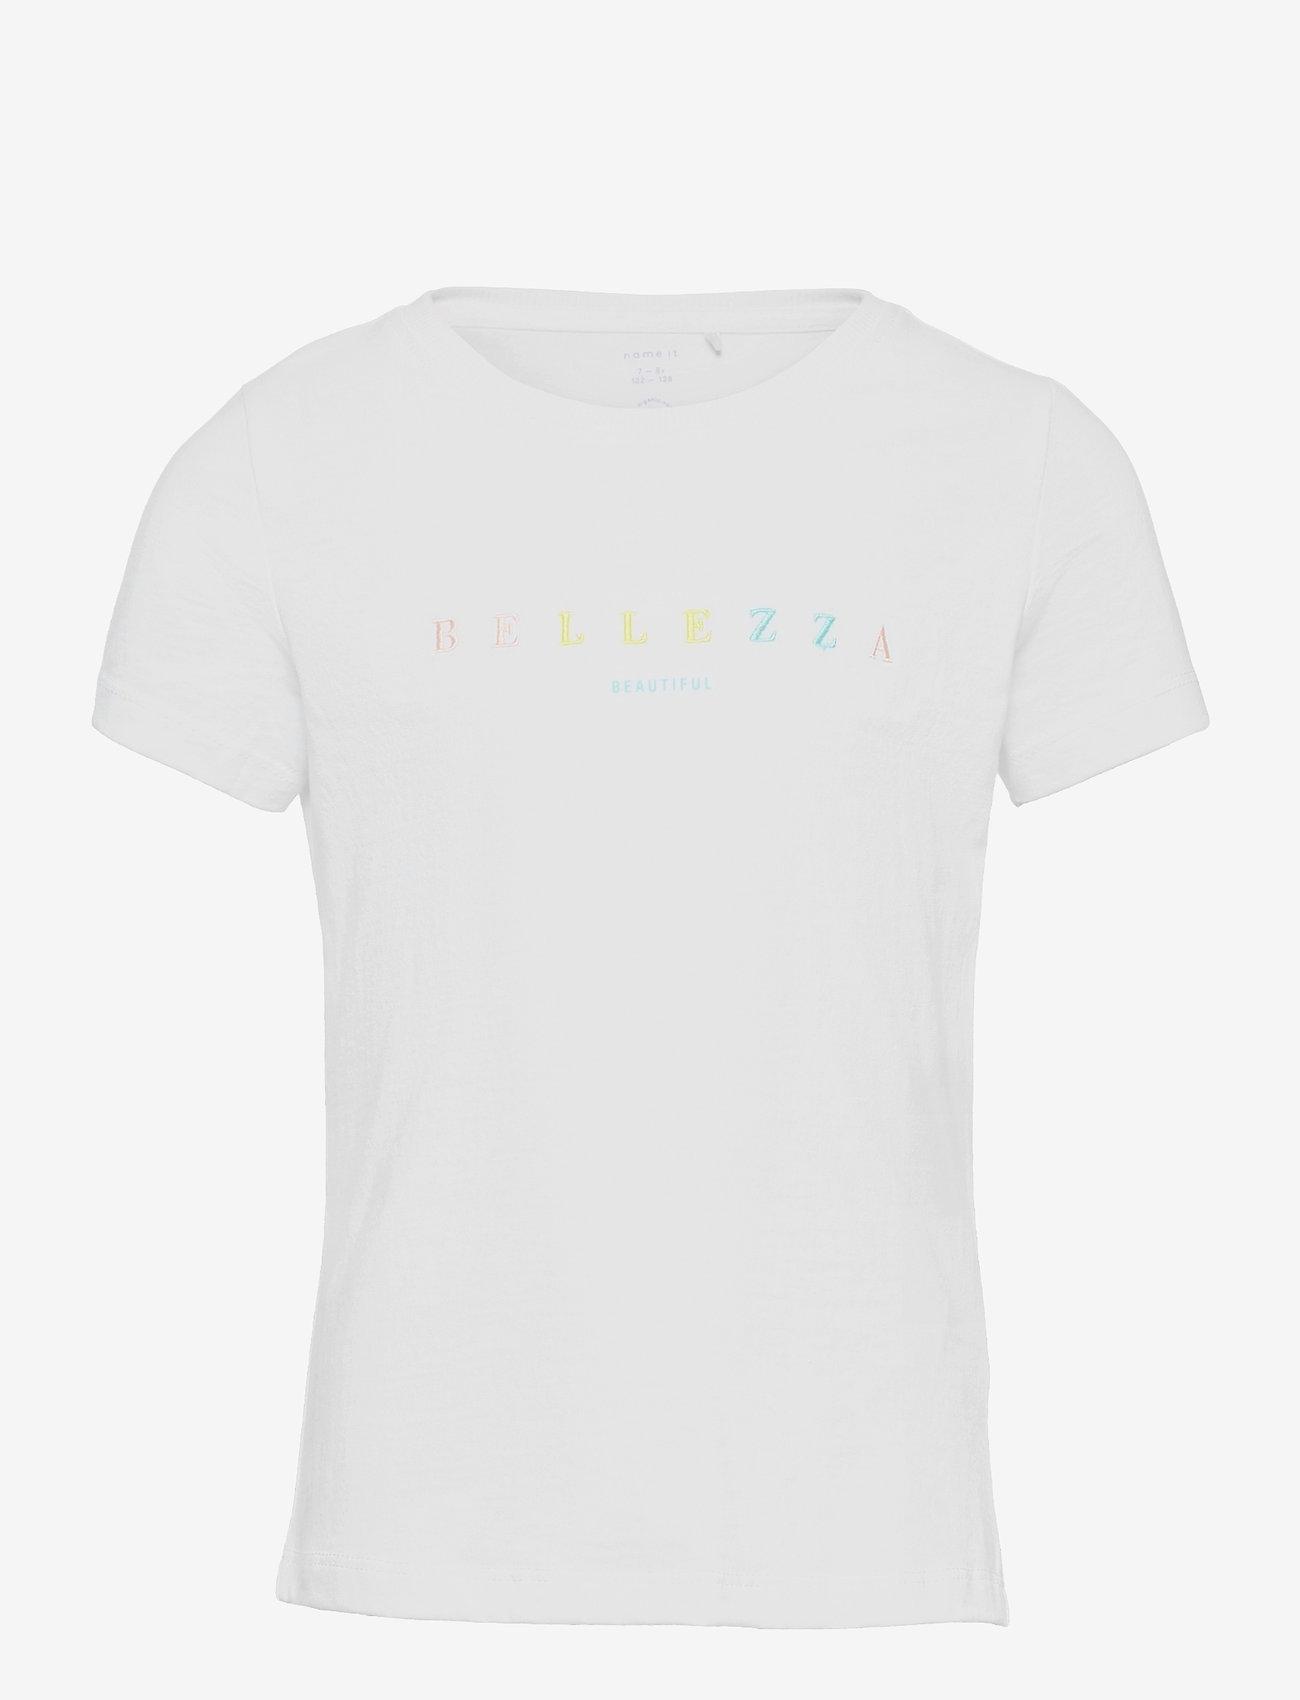 name it - NKFHABA SS TOP - t-shirts - bright white - 0